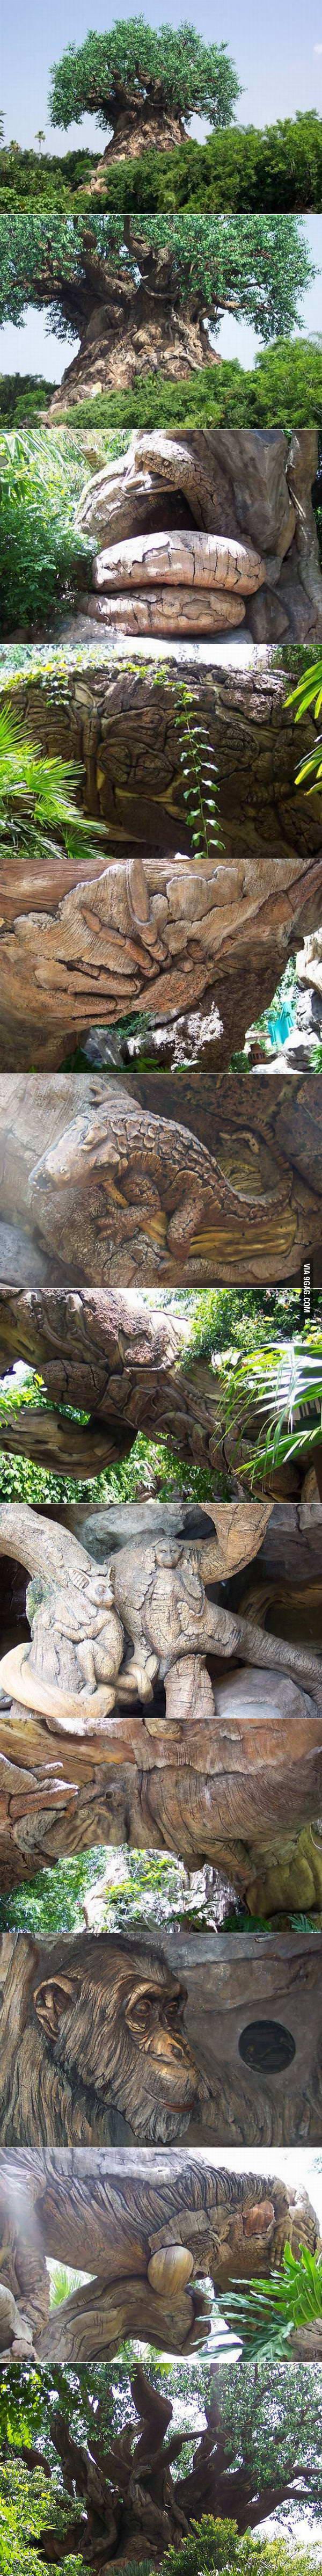 Carved baobab